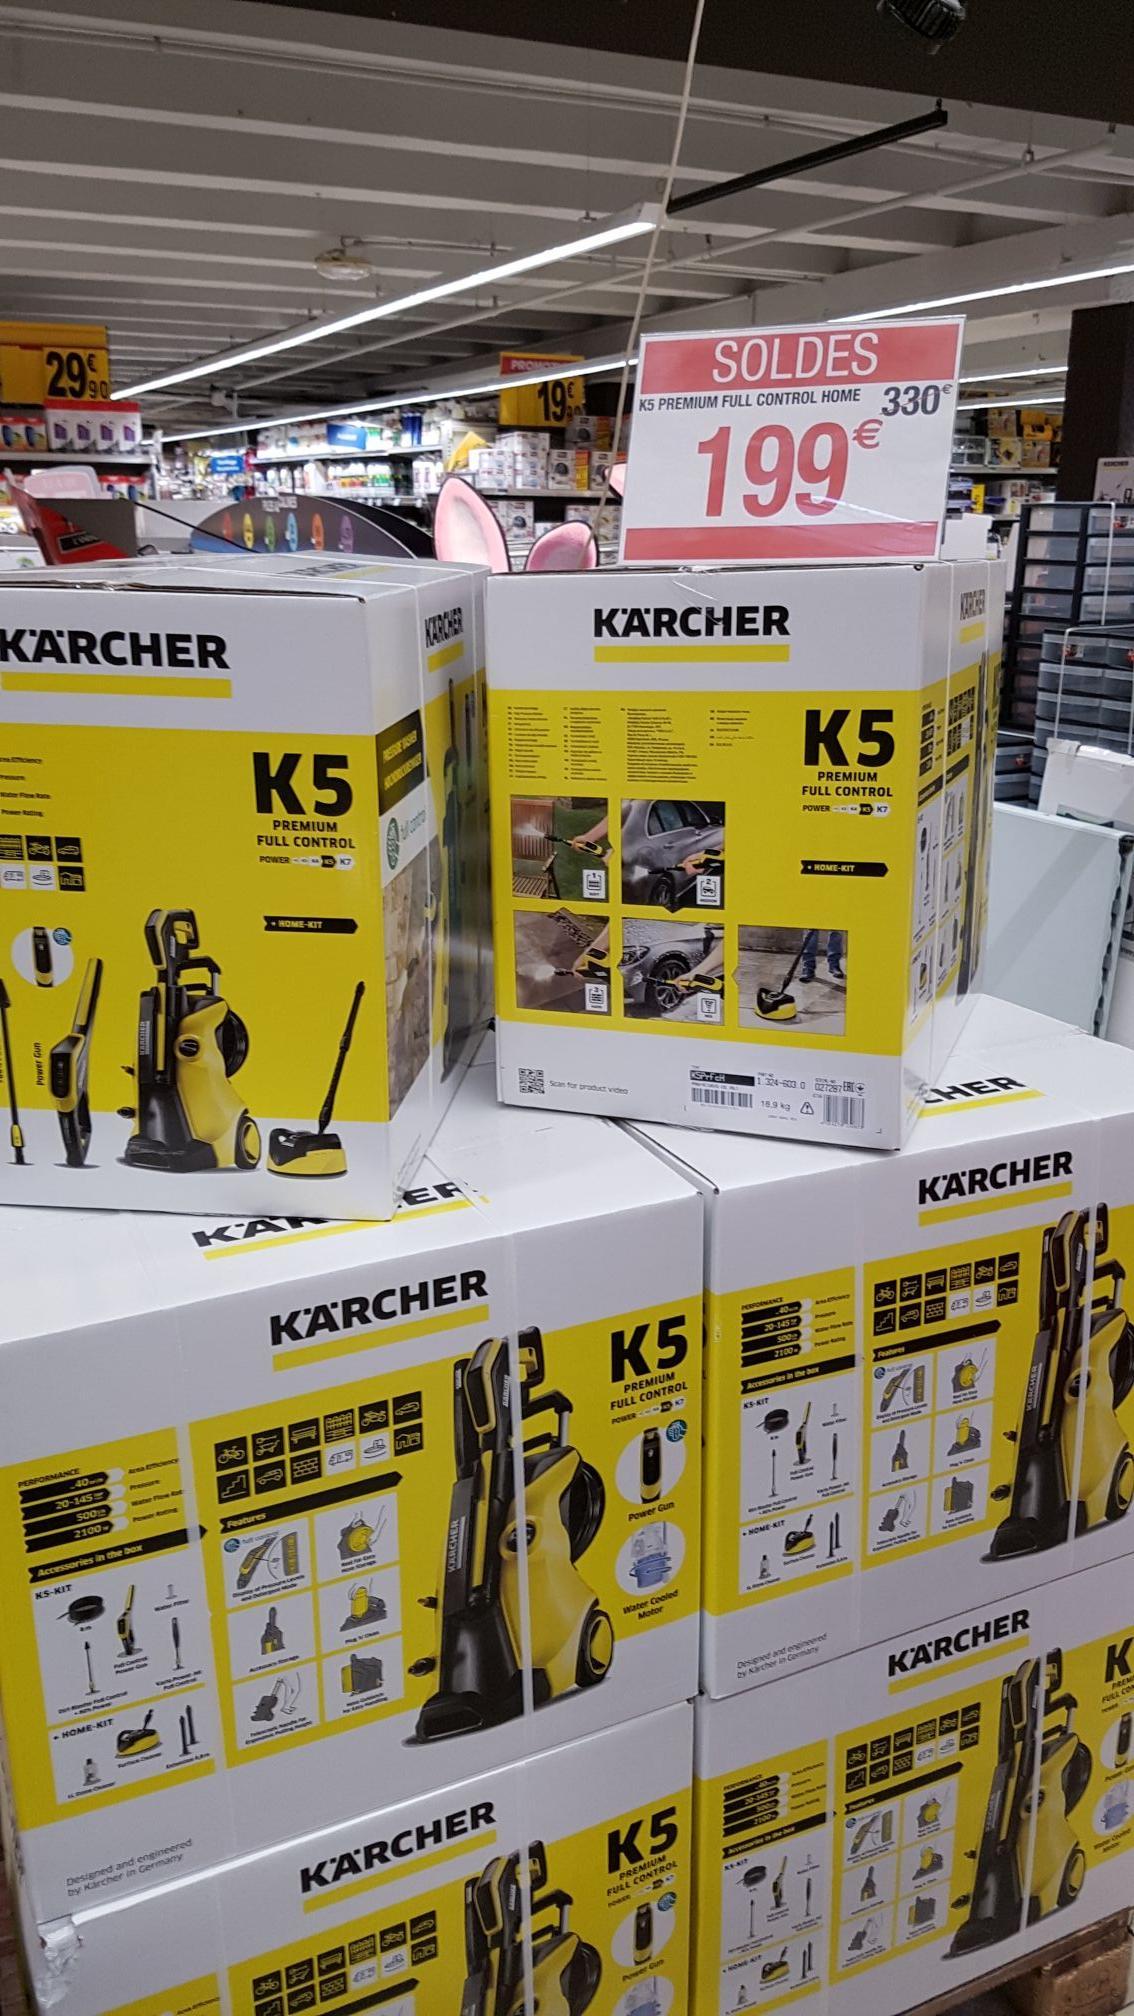 Nettoyeur haute pression Karcher K5 Premium Full Control + Home Kit